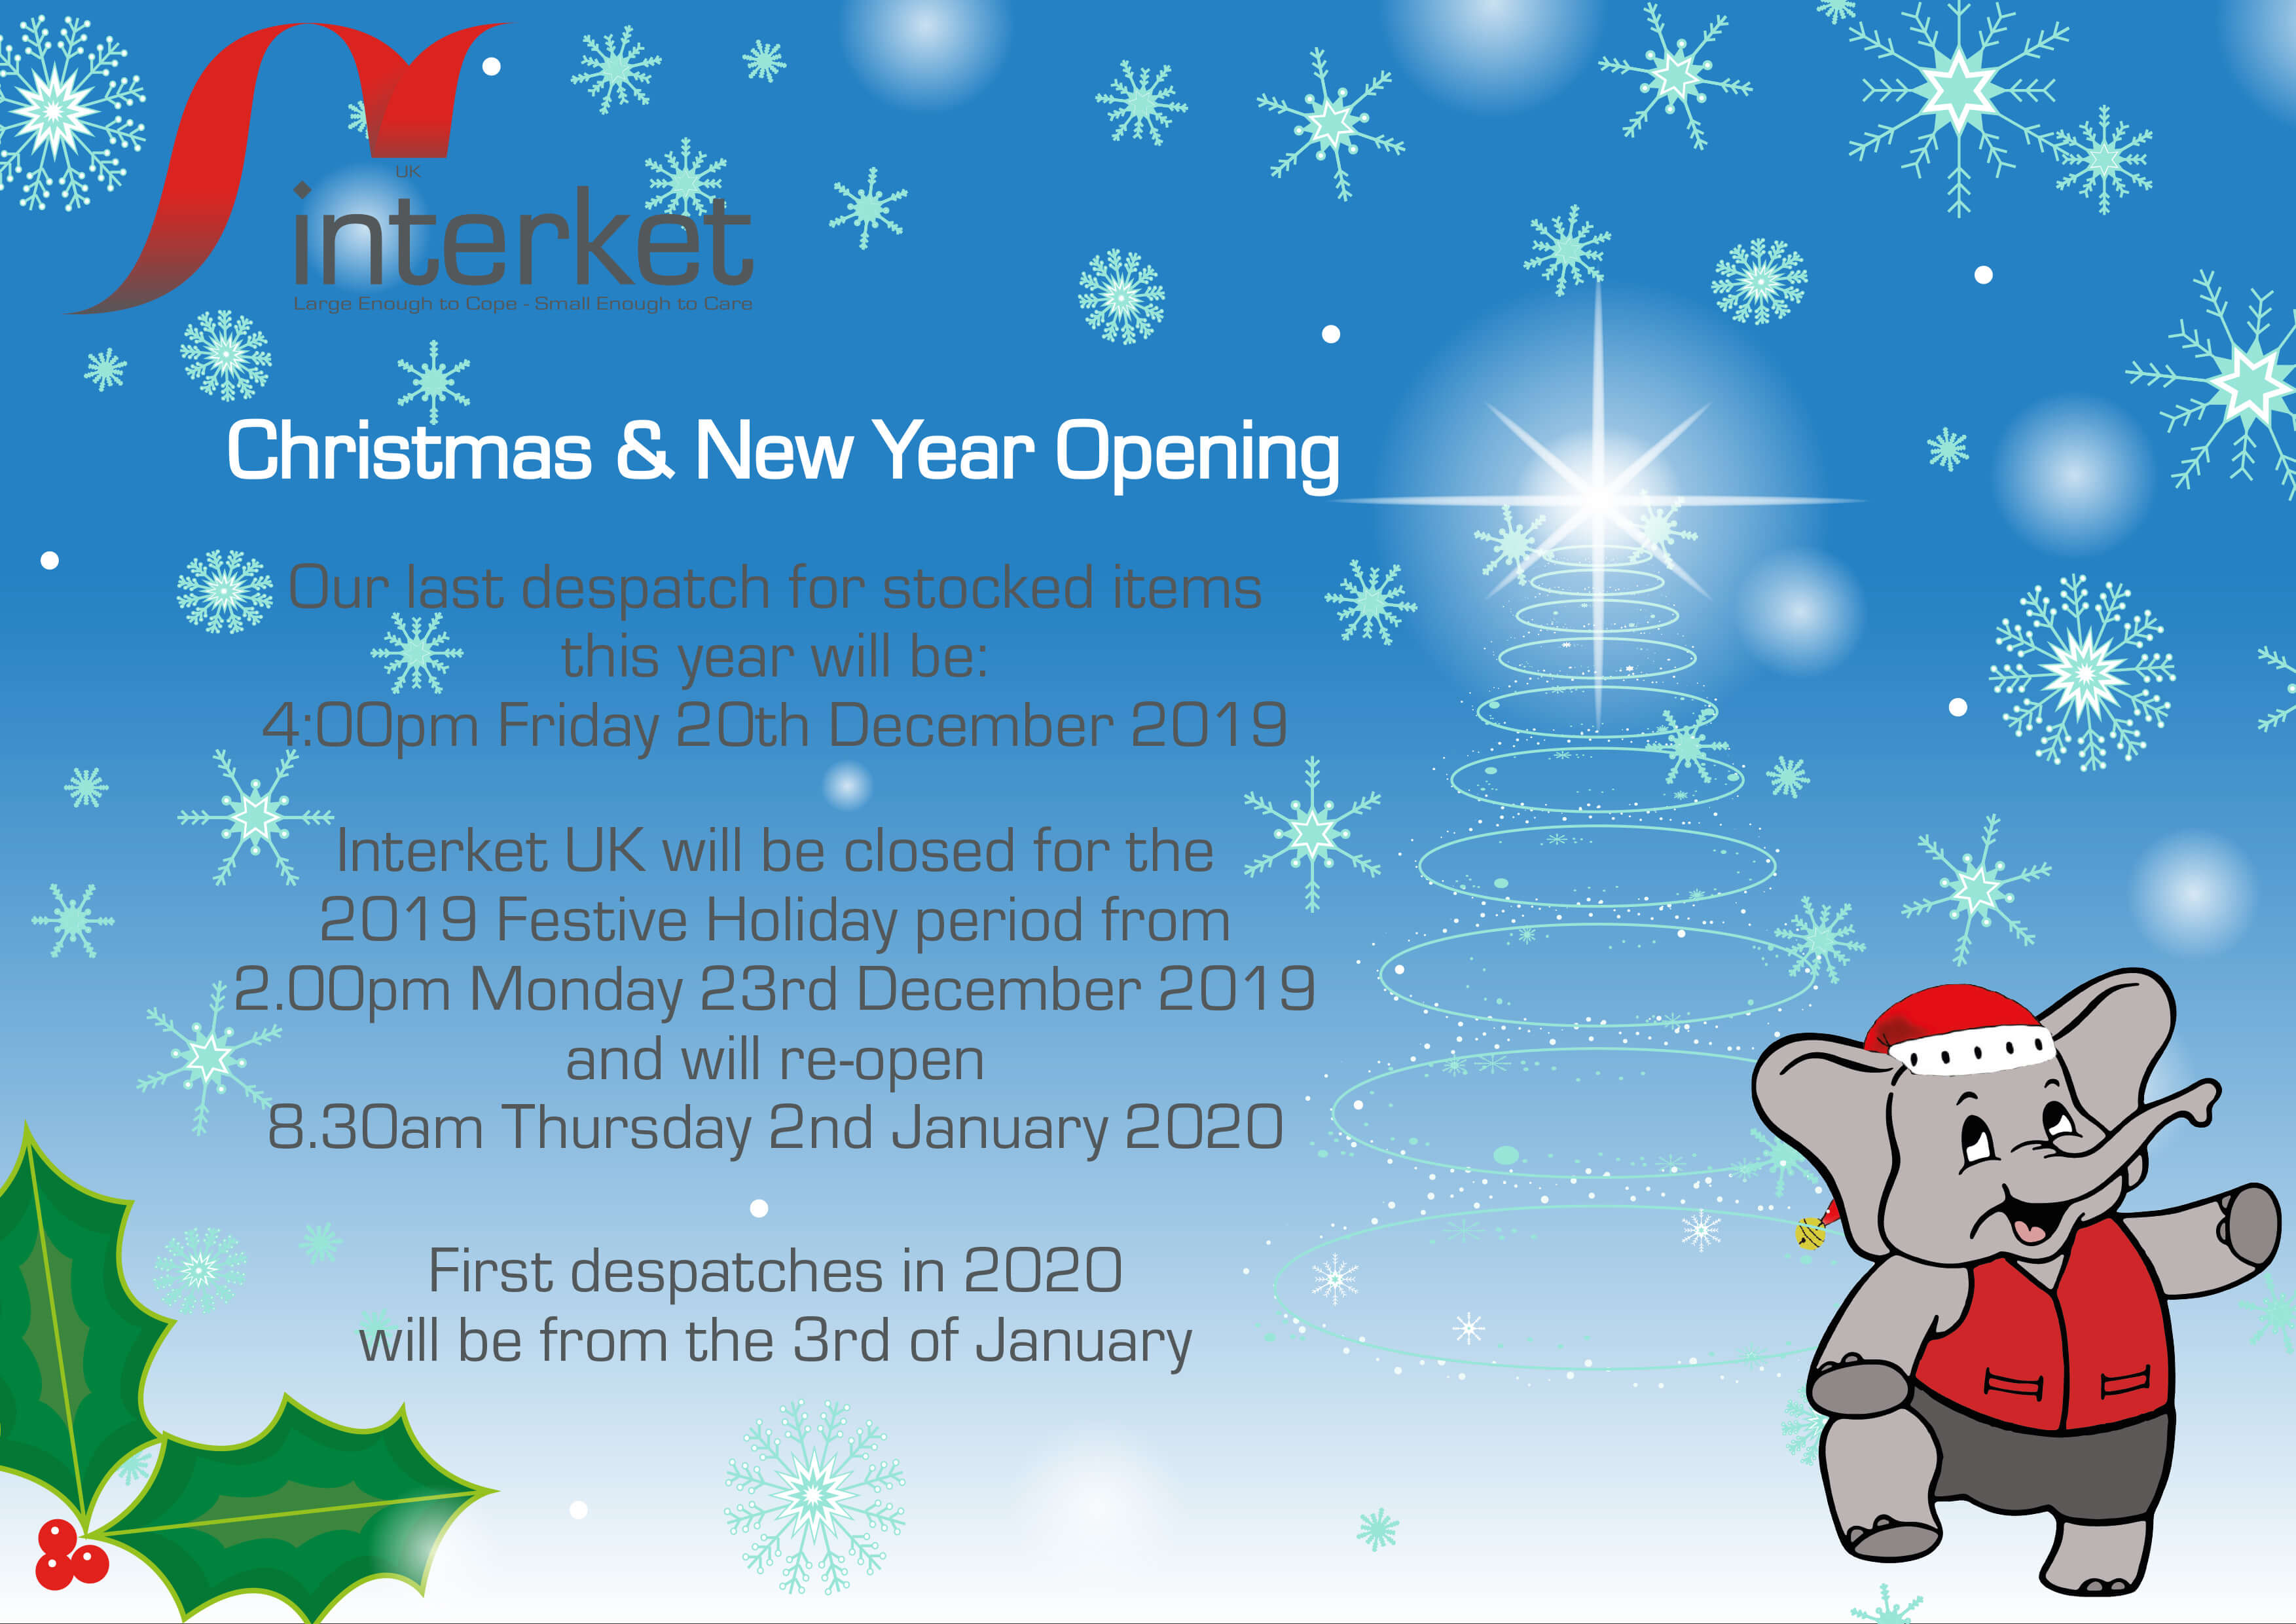 Interket Christmas Opening Hours 2019